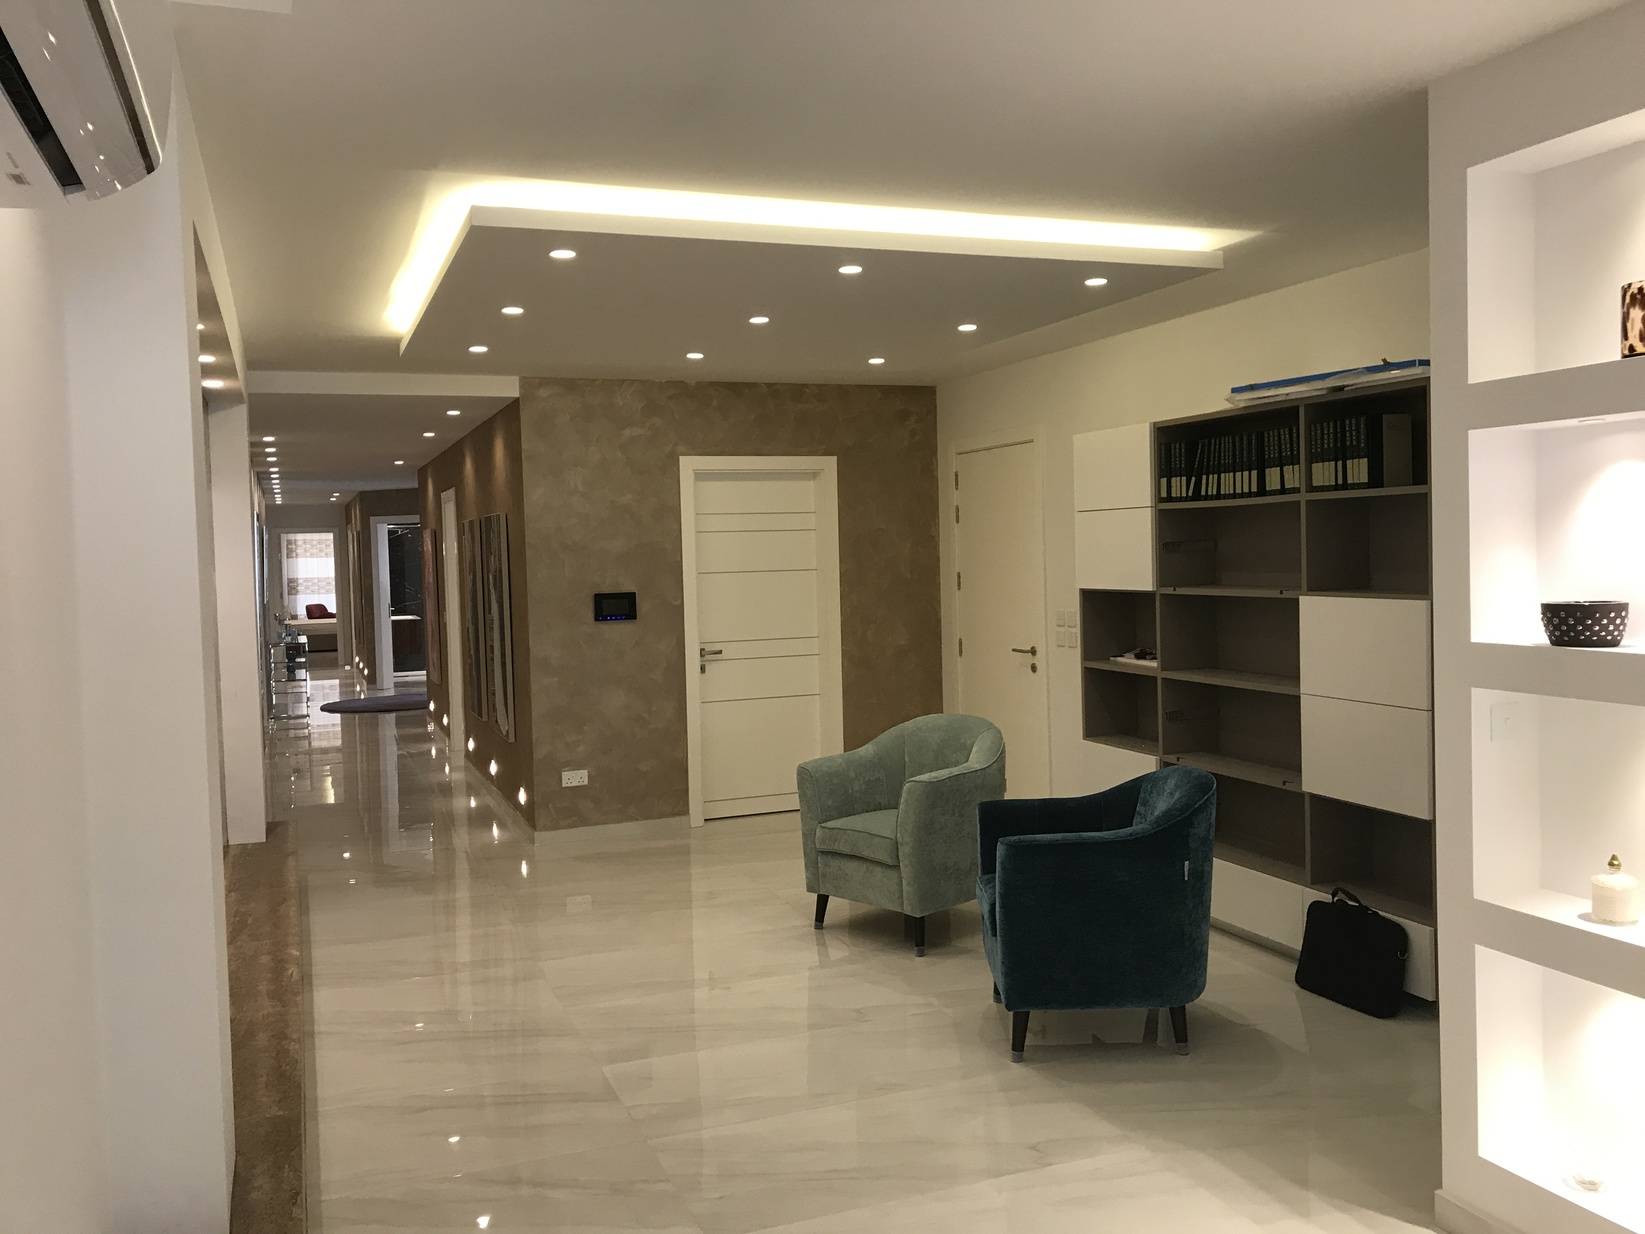 3 bed Apartment For Rent in Qawra, Qawra - thumb 8